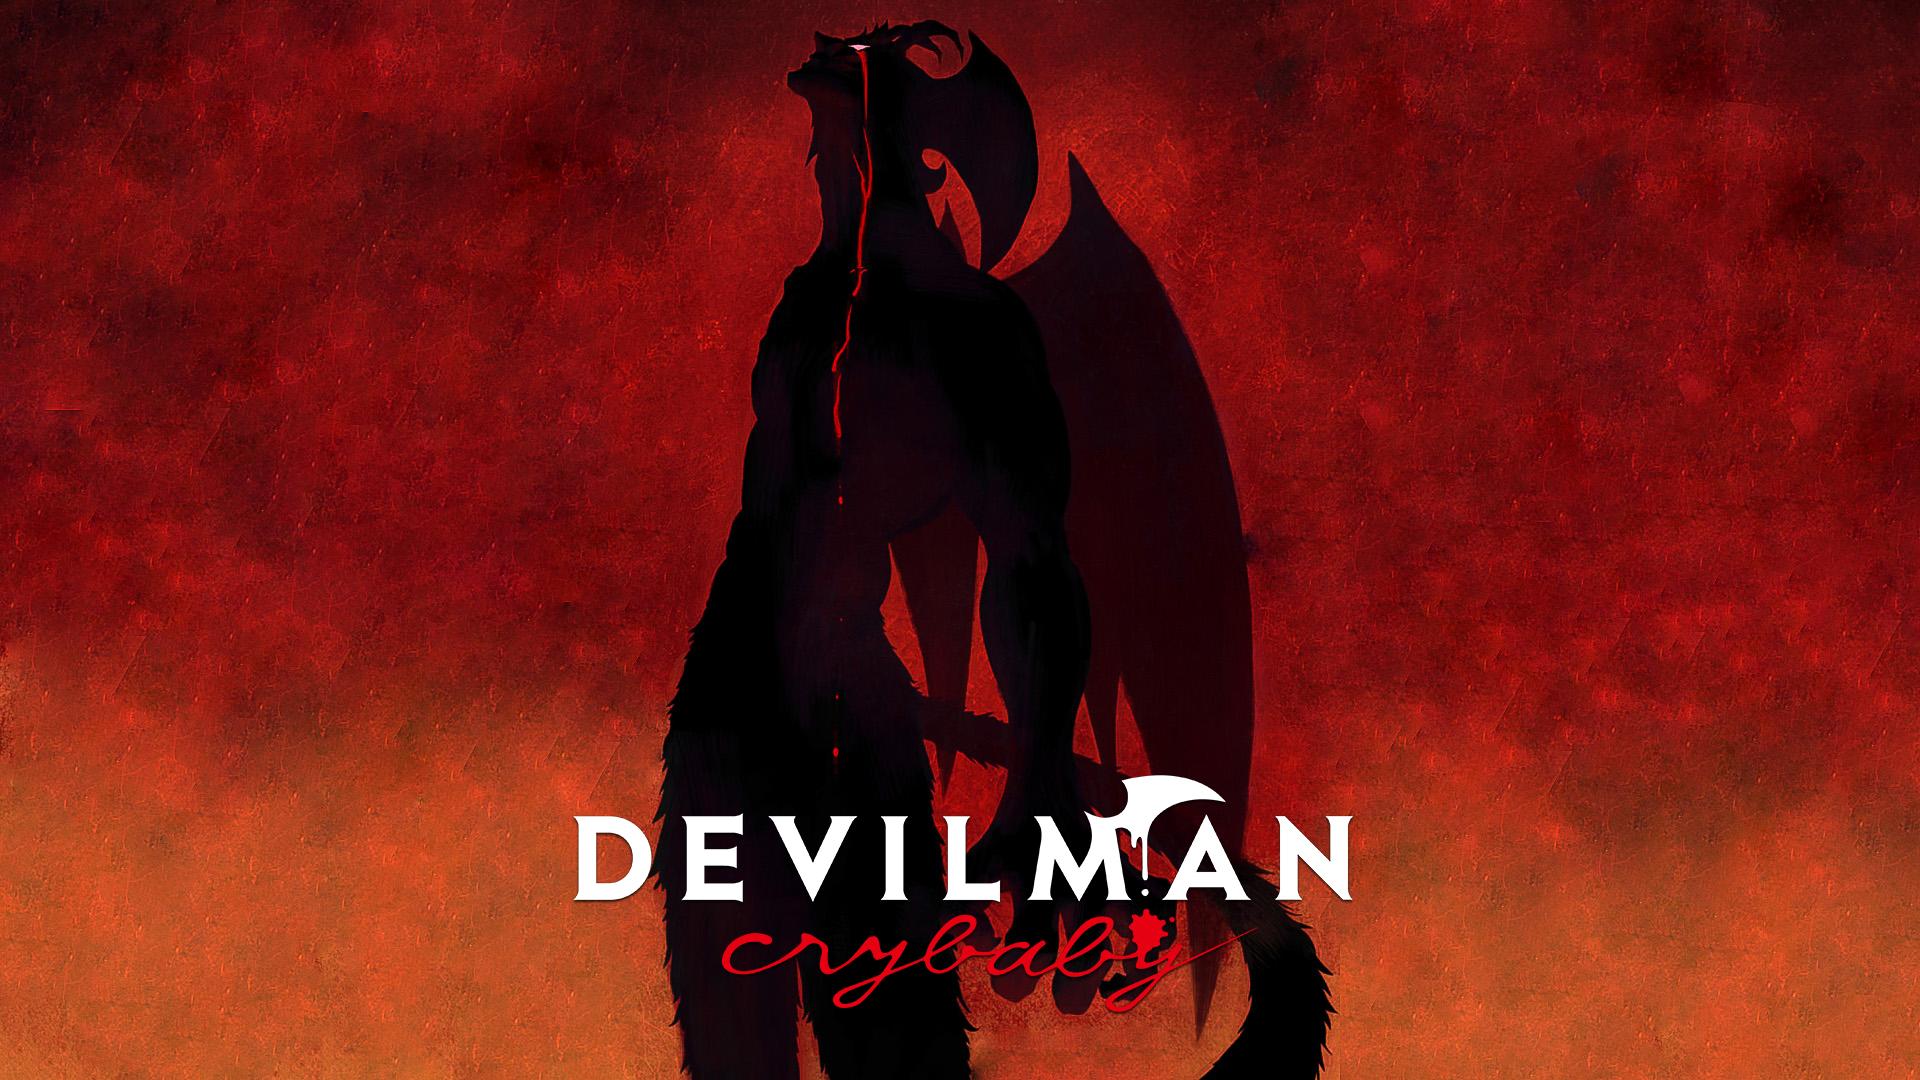 Wallpaper Akira Fudo Devilman Crybaby Red 1920x1080 Arvulic 1558135 Hd Wallpapers Wallhere